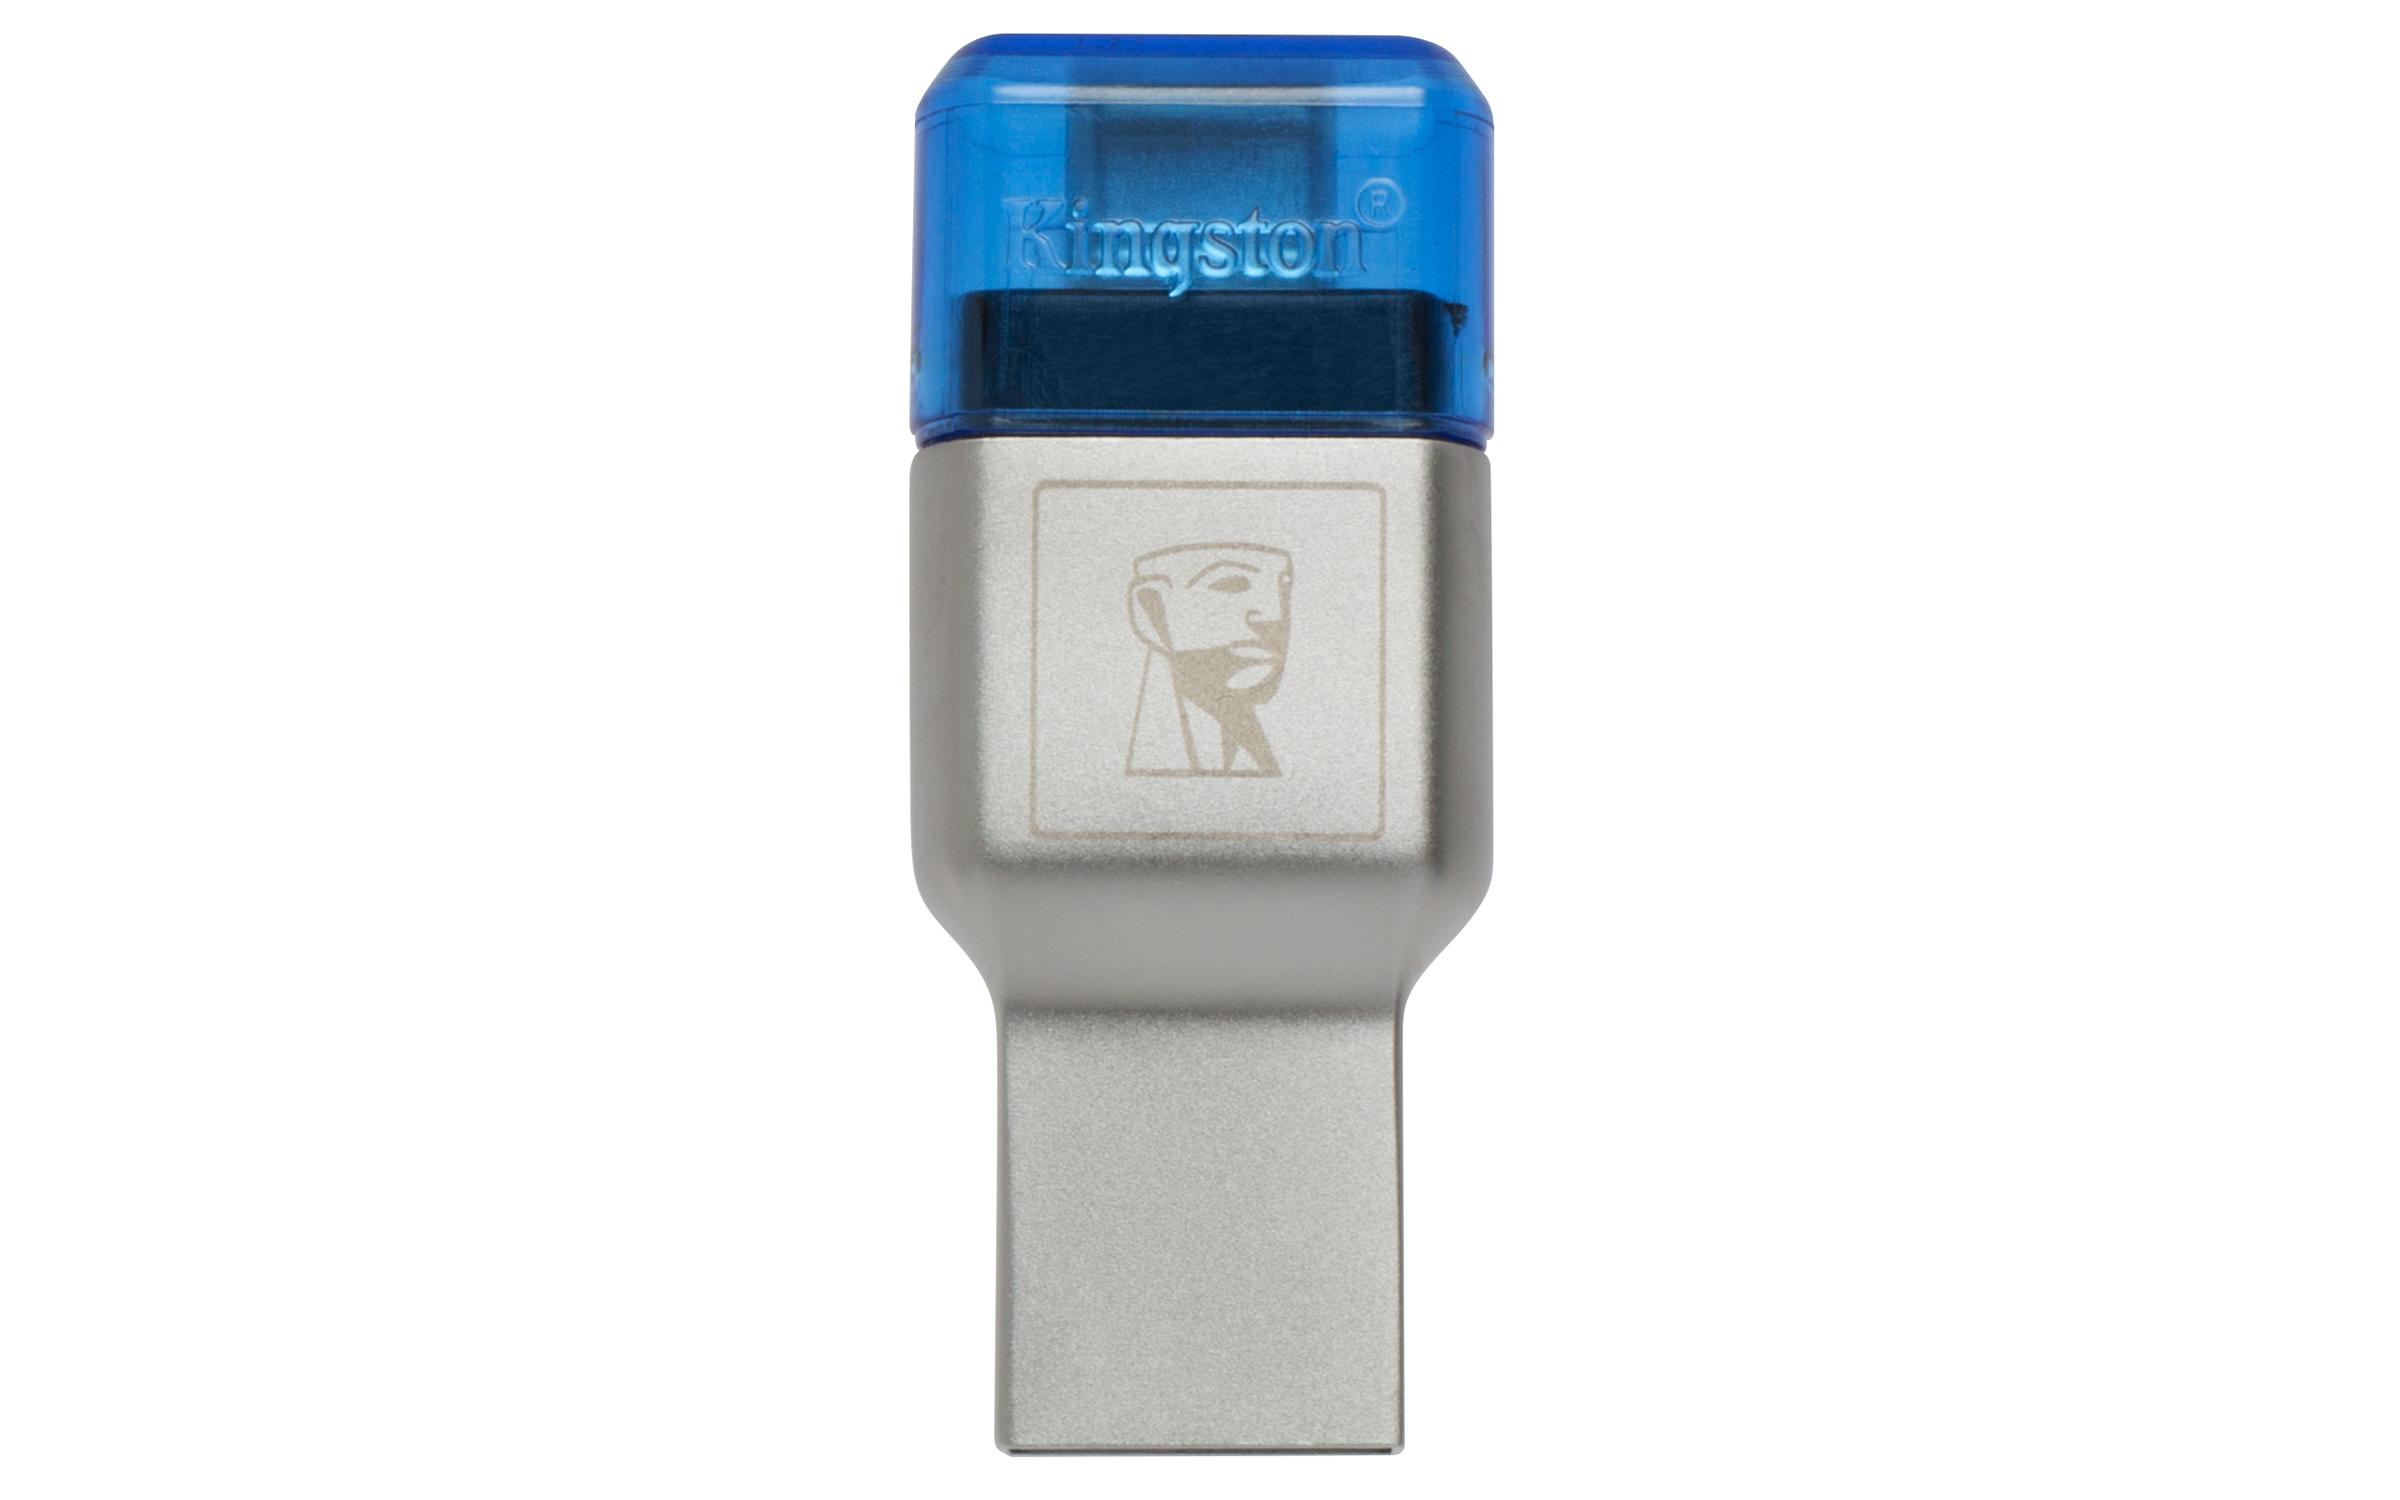 kingston microsd card reader usb type c 1 Kingston เปิดตัว MicroSD Card Reader ในแบบ USB Type C รุ่นใหม่ล่าสุด